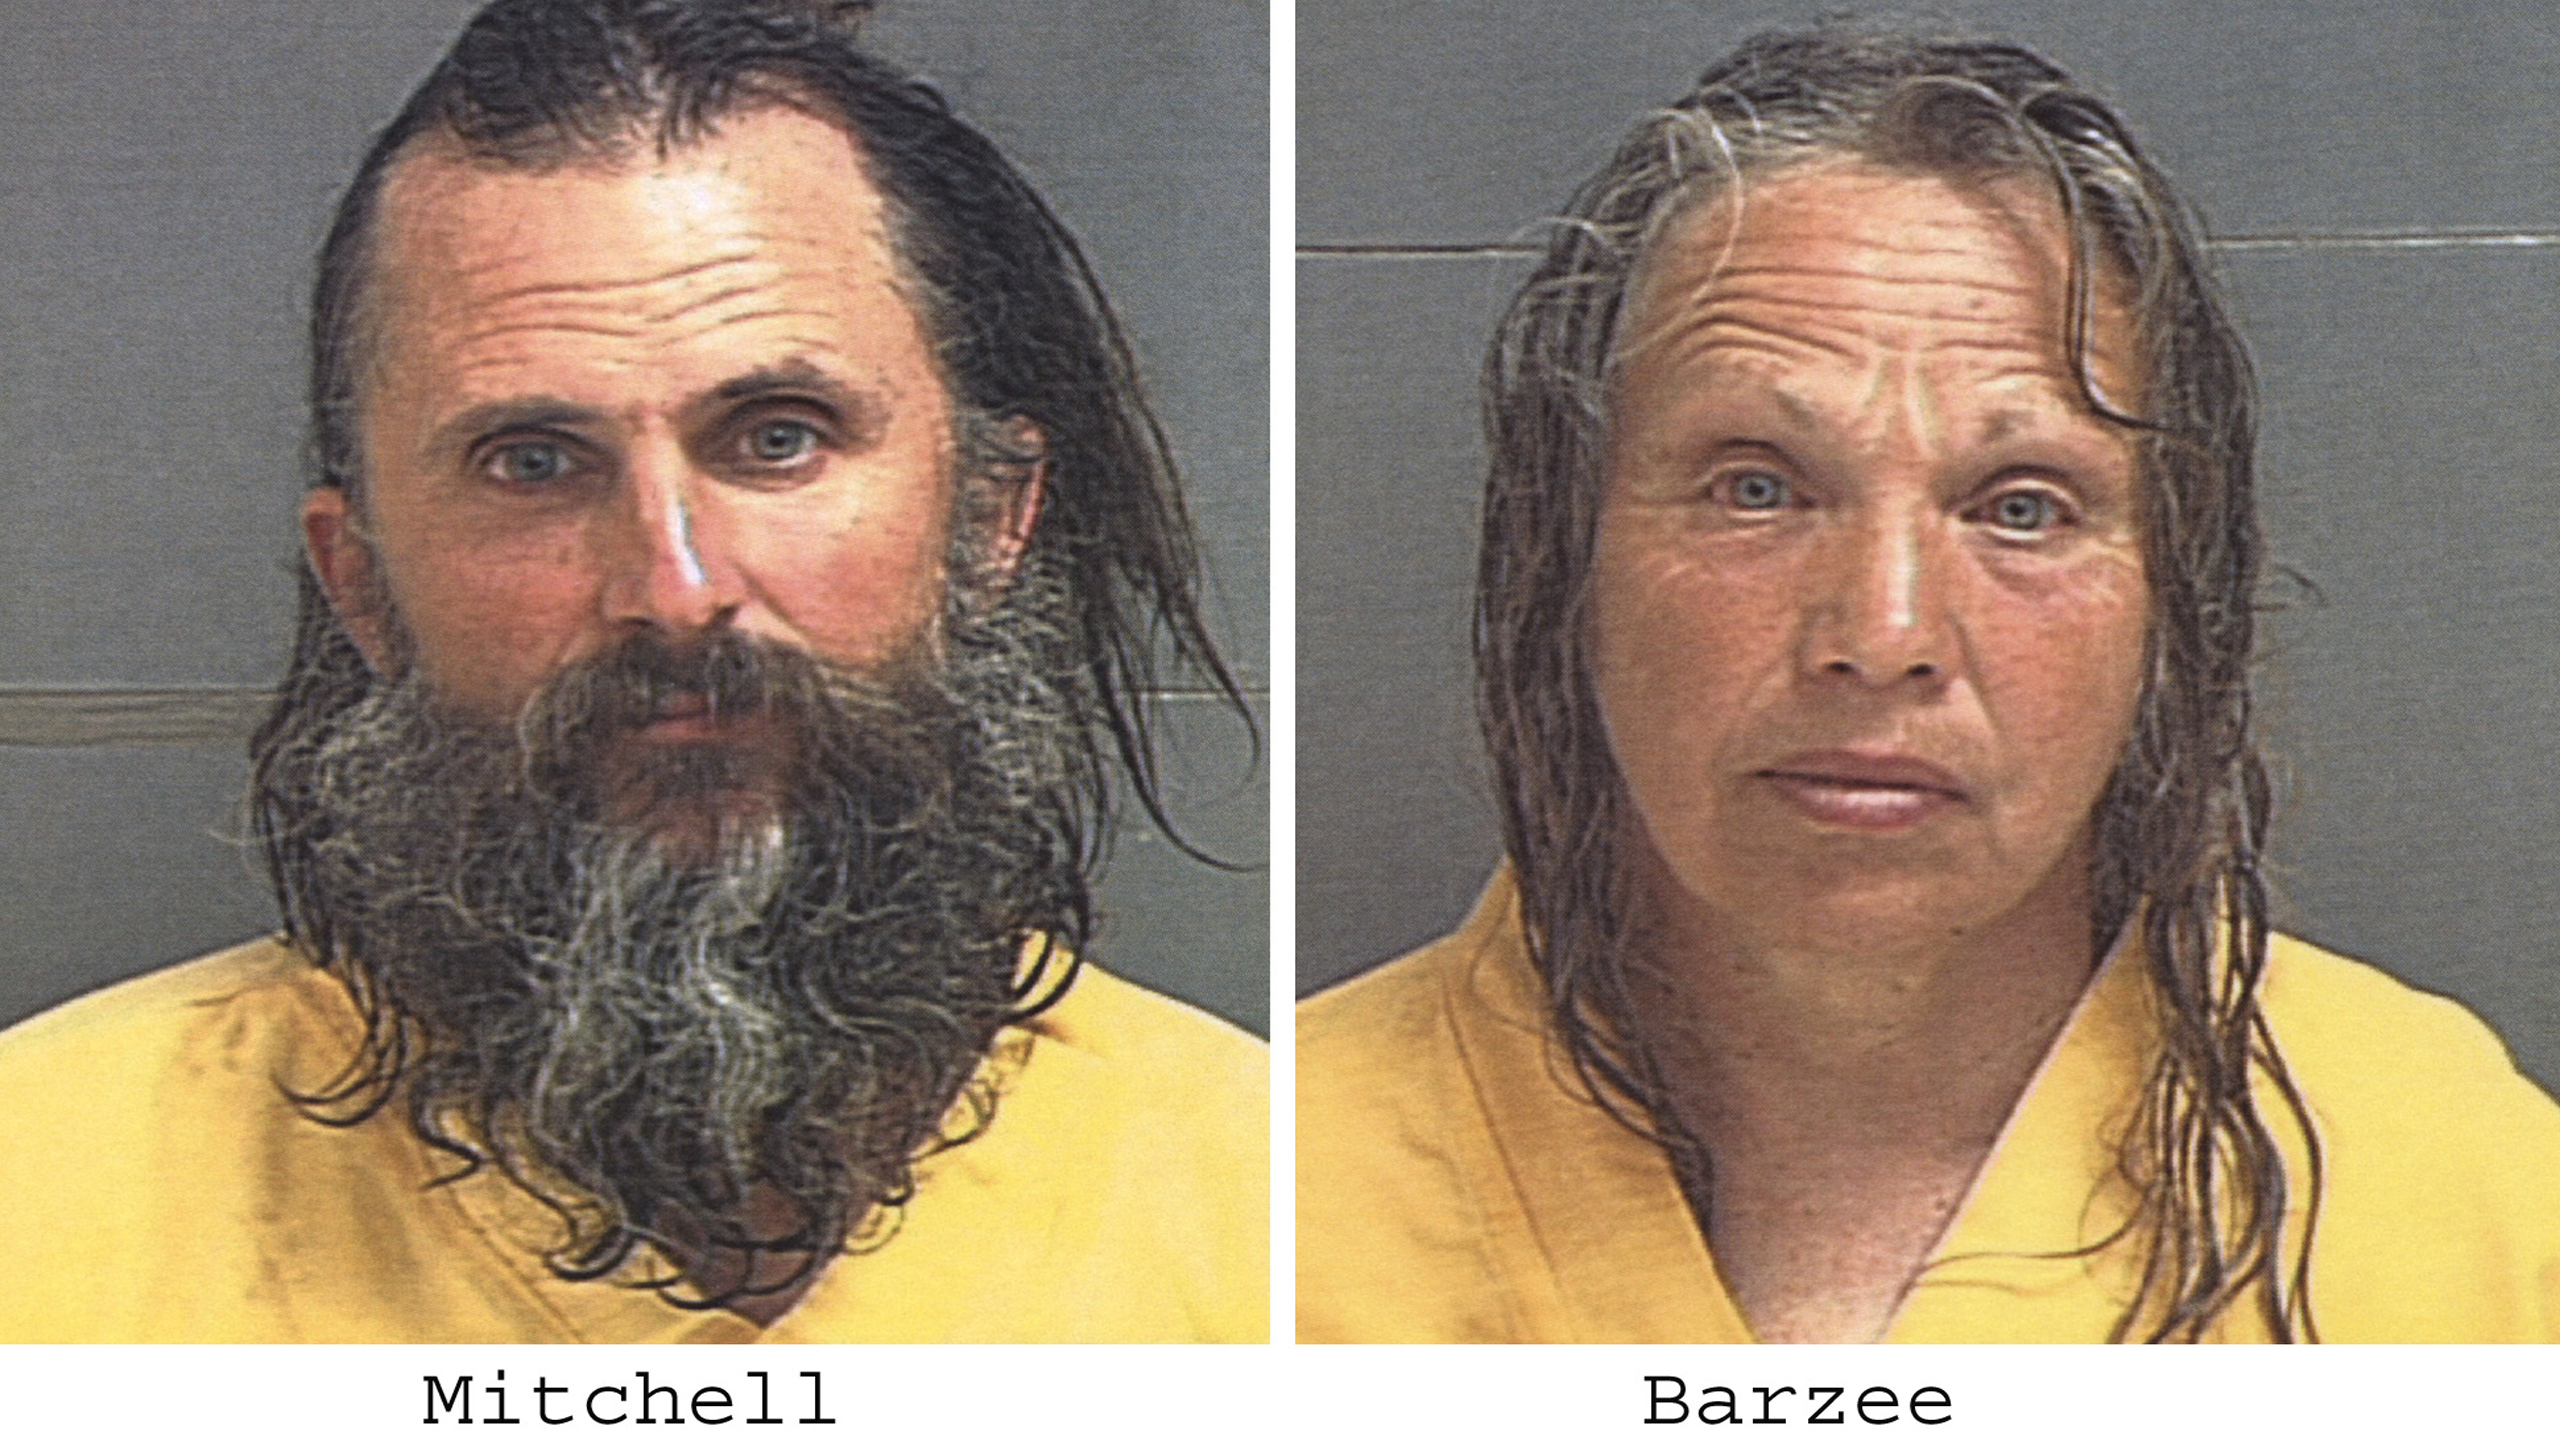 Brian Mitchell and Wanda Barzee